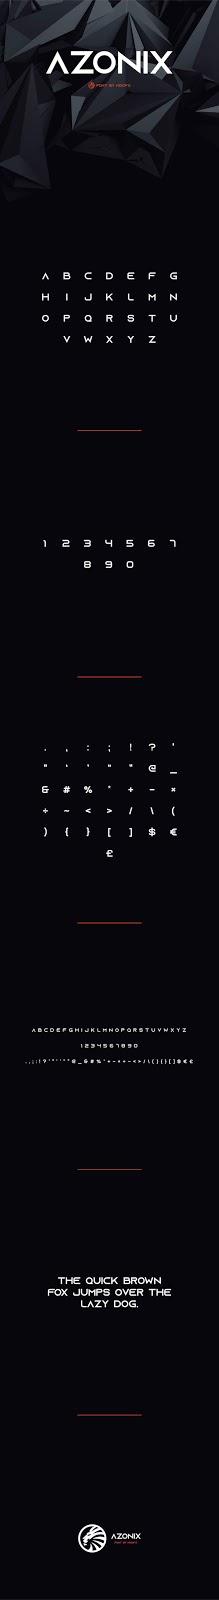 AZONIX - FREE MODERN TYPEFACE